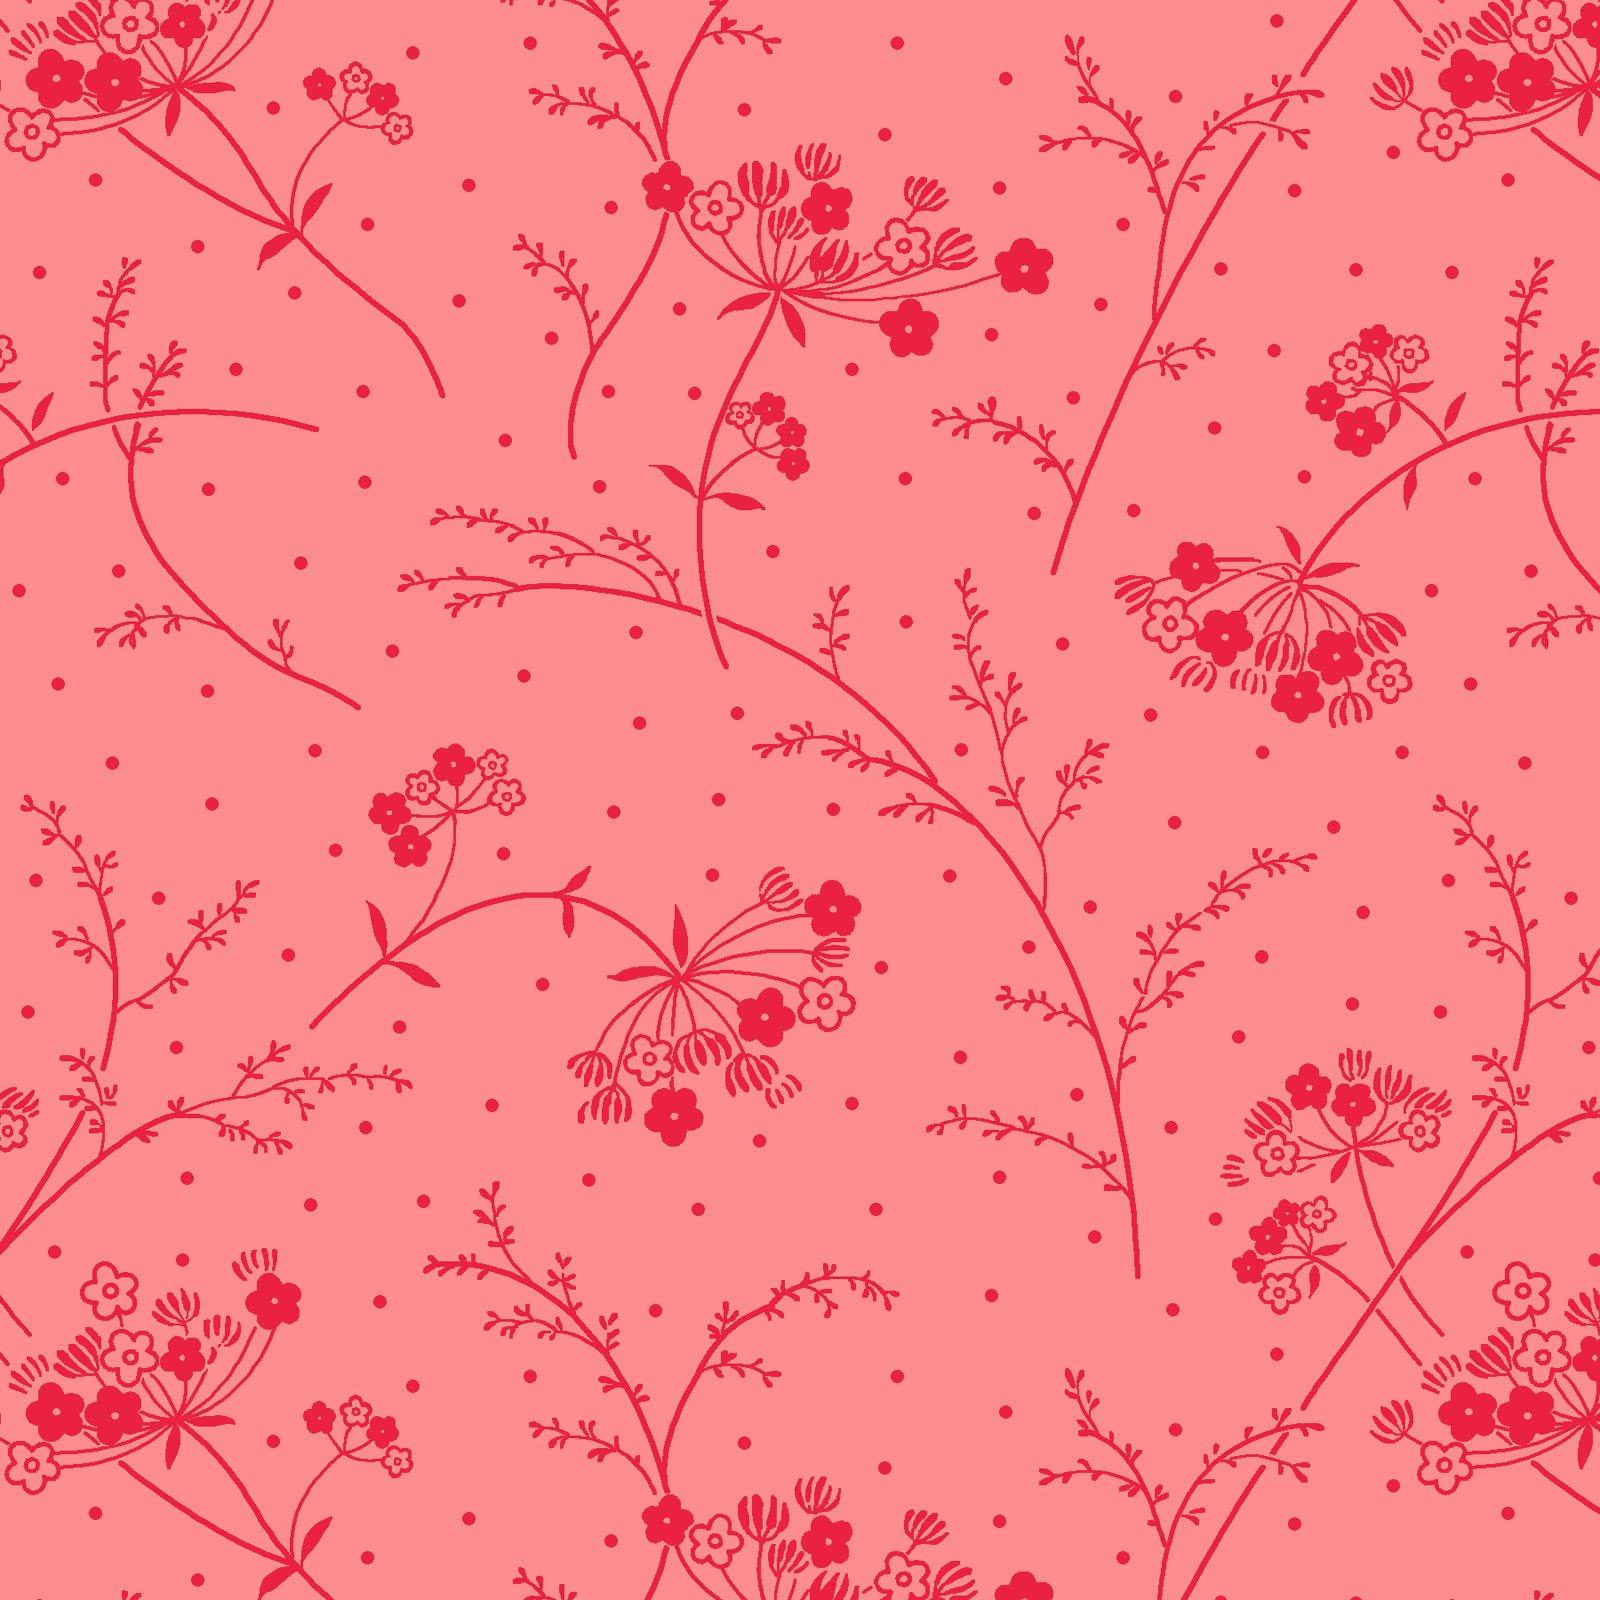 Kimberbell 108 Wide Back - Make a Wish - Pink